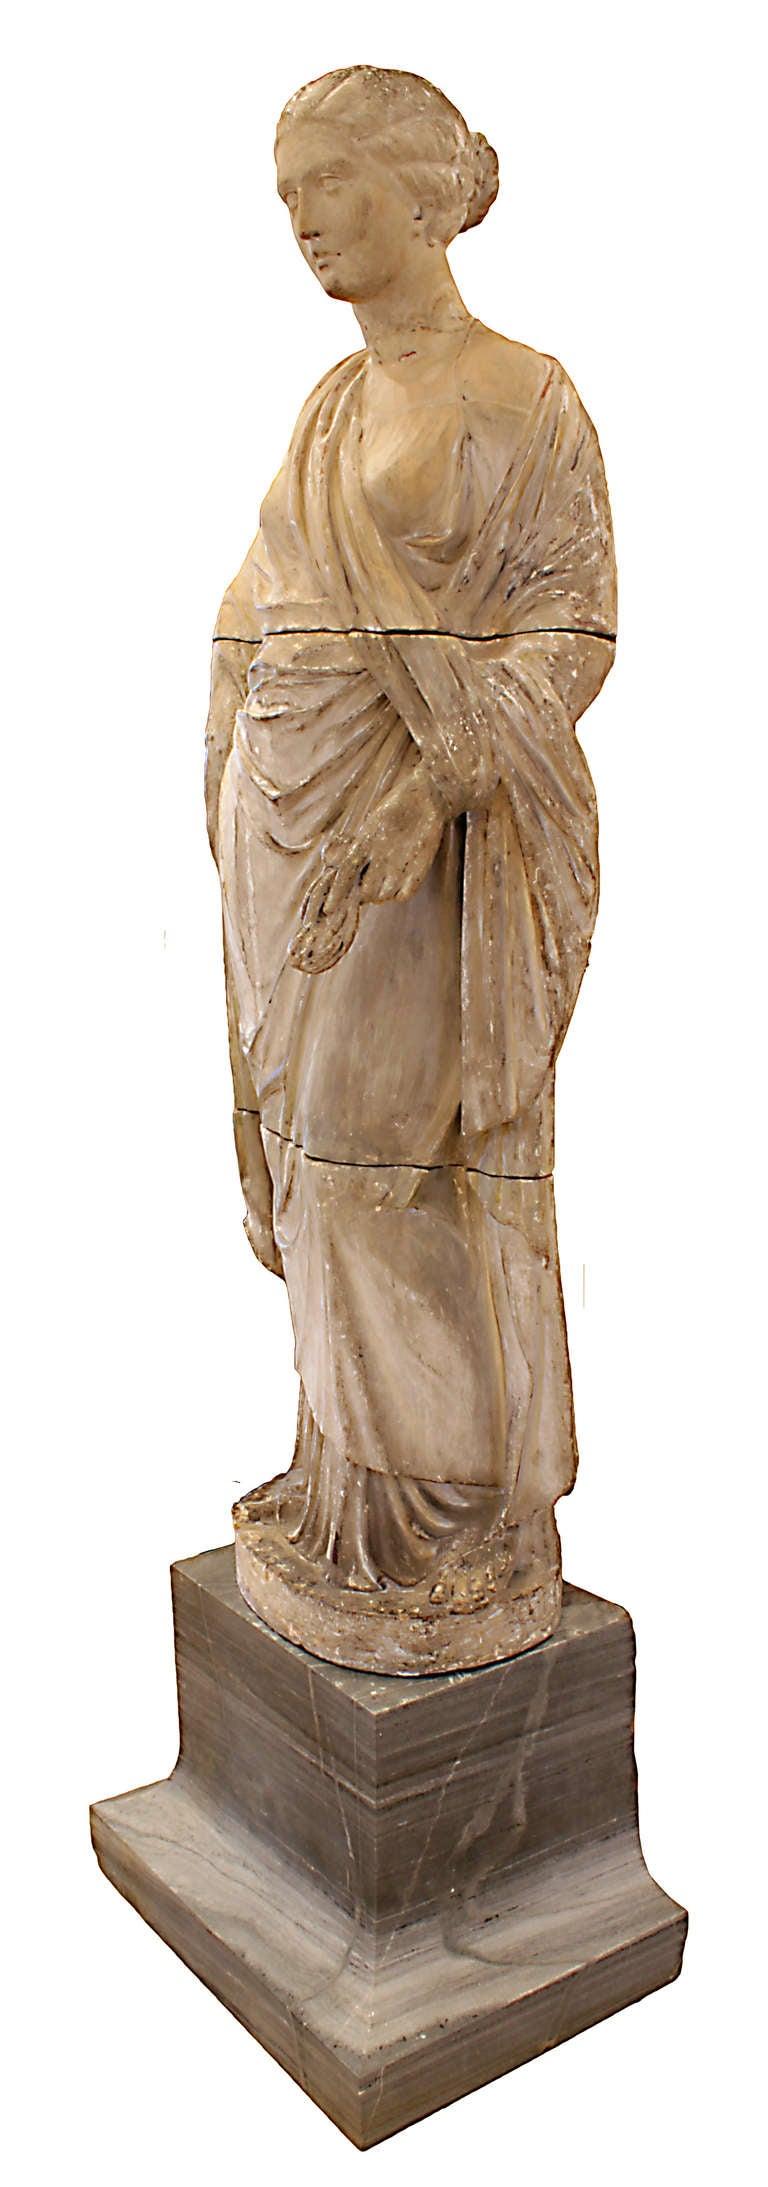 A Monumental Italian 18th Century Terracotta Statue For